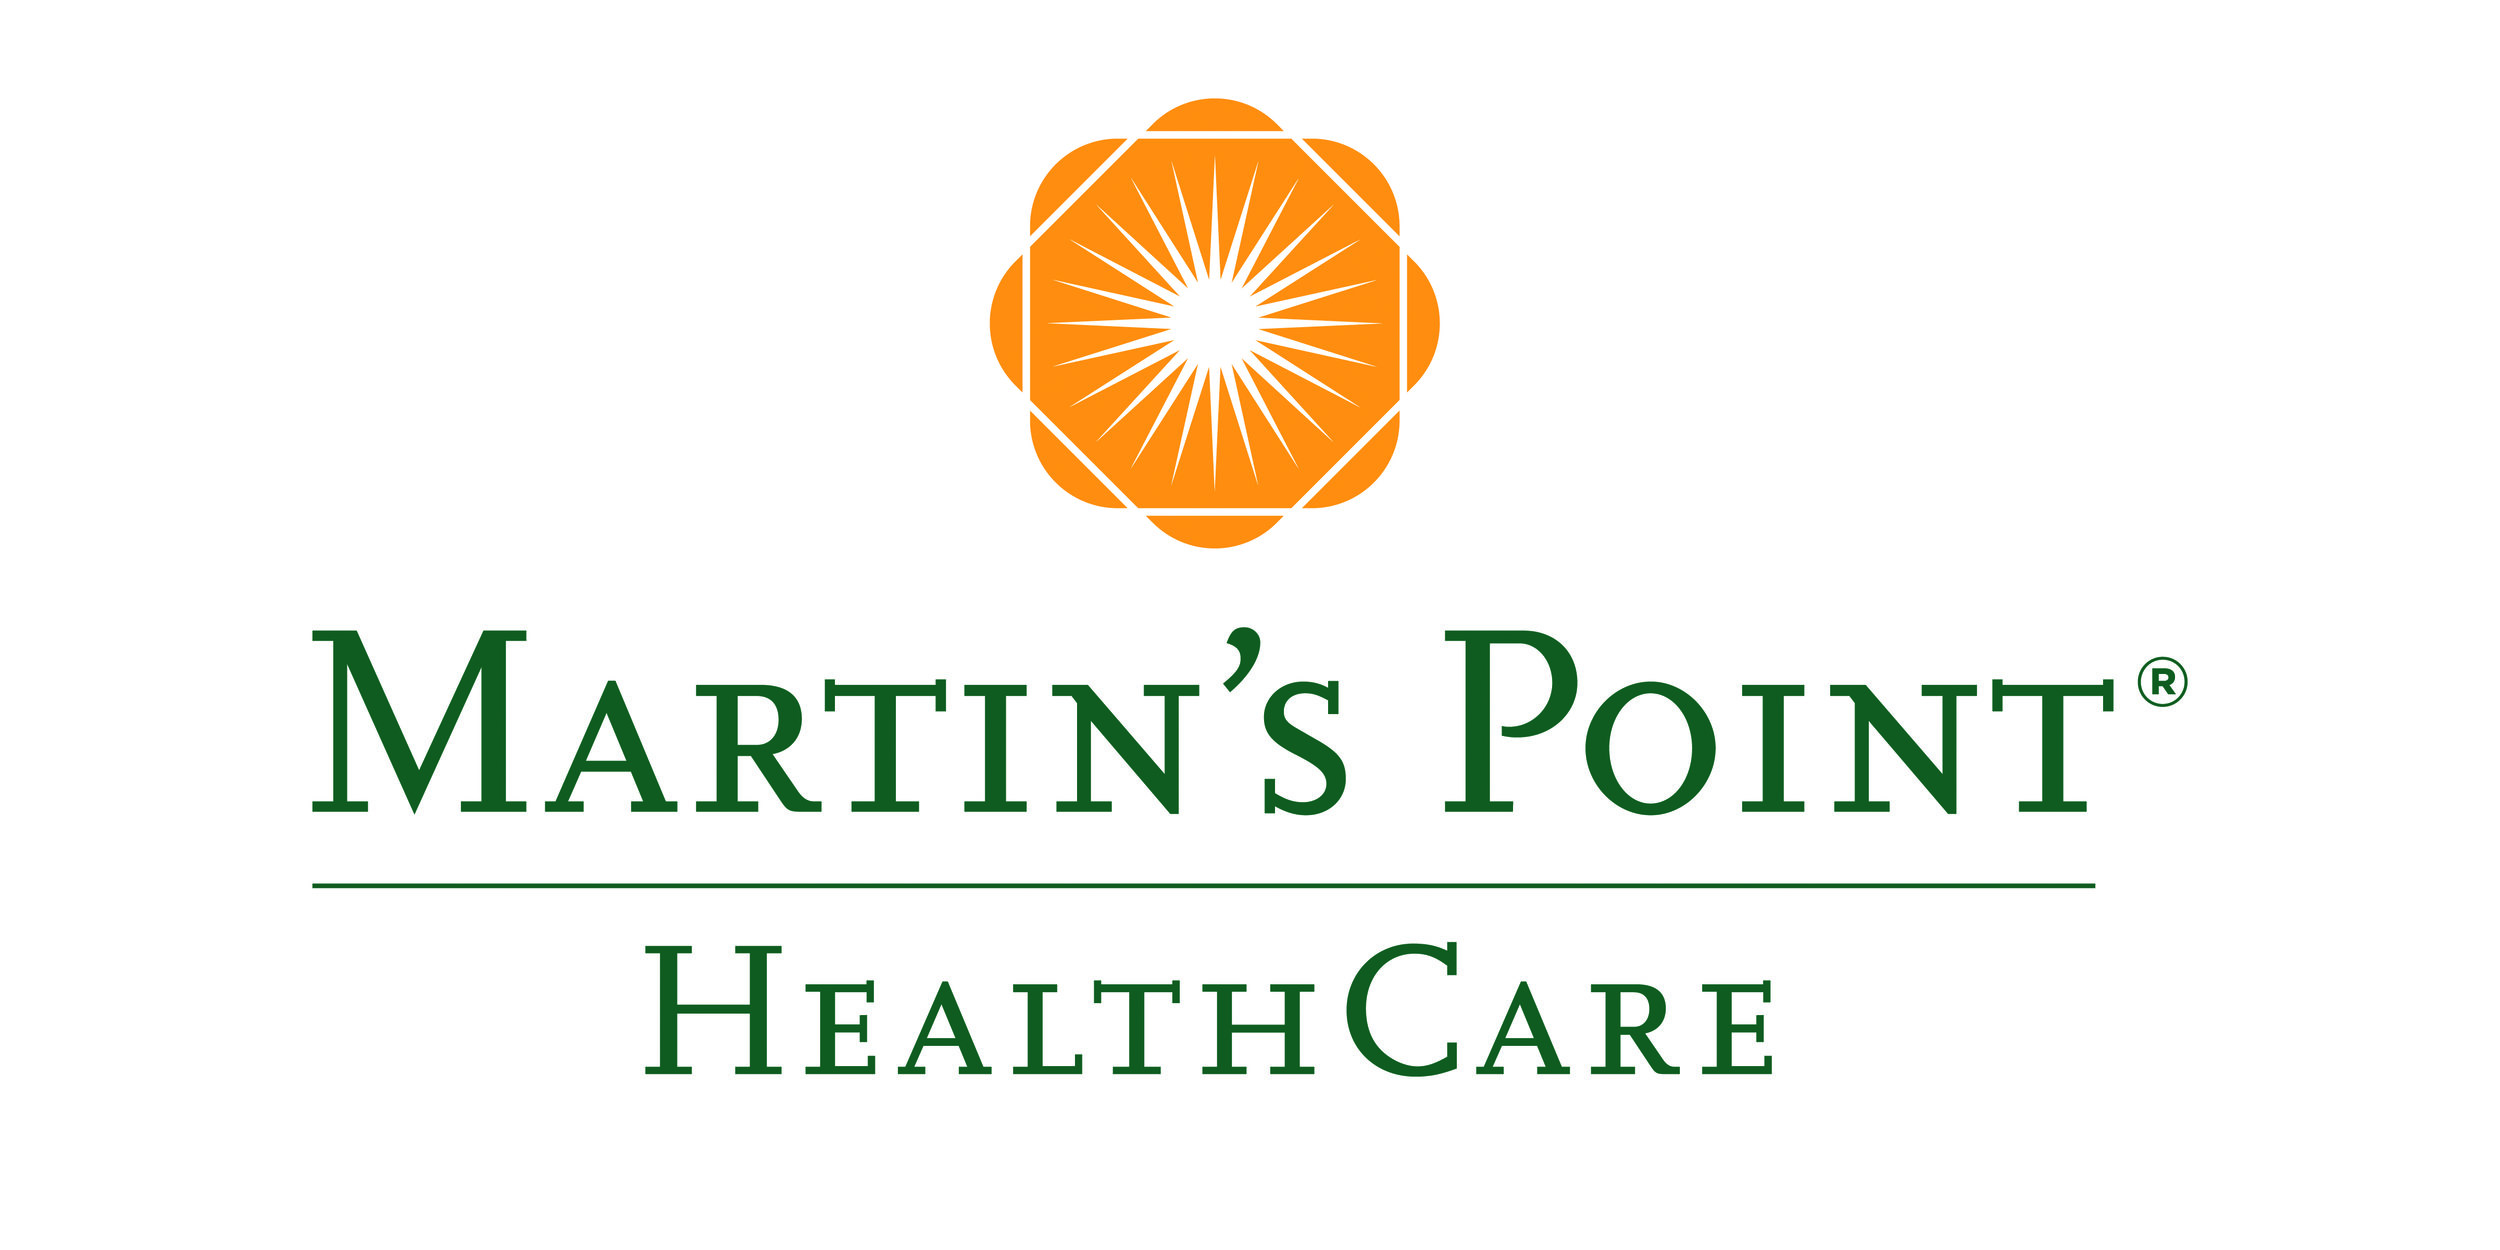 martins point logo.JPG